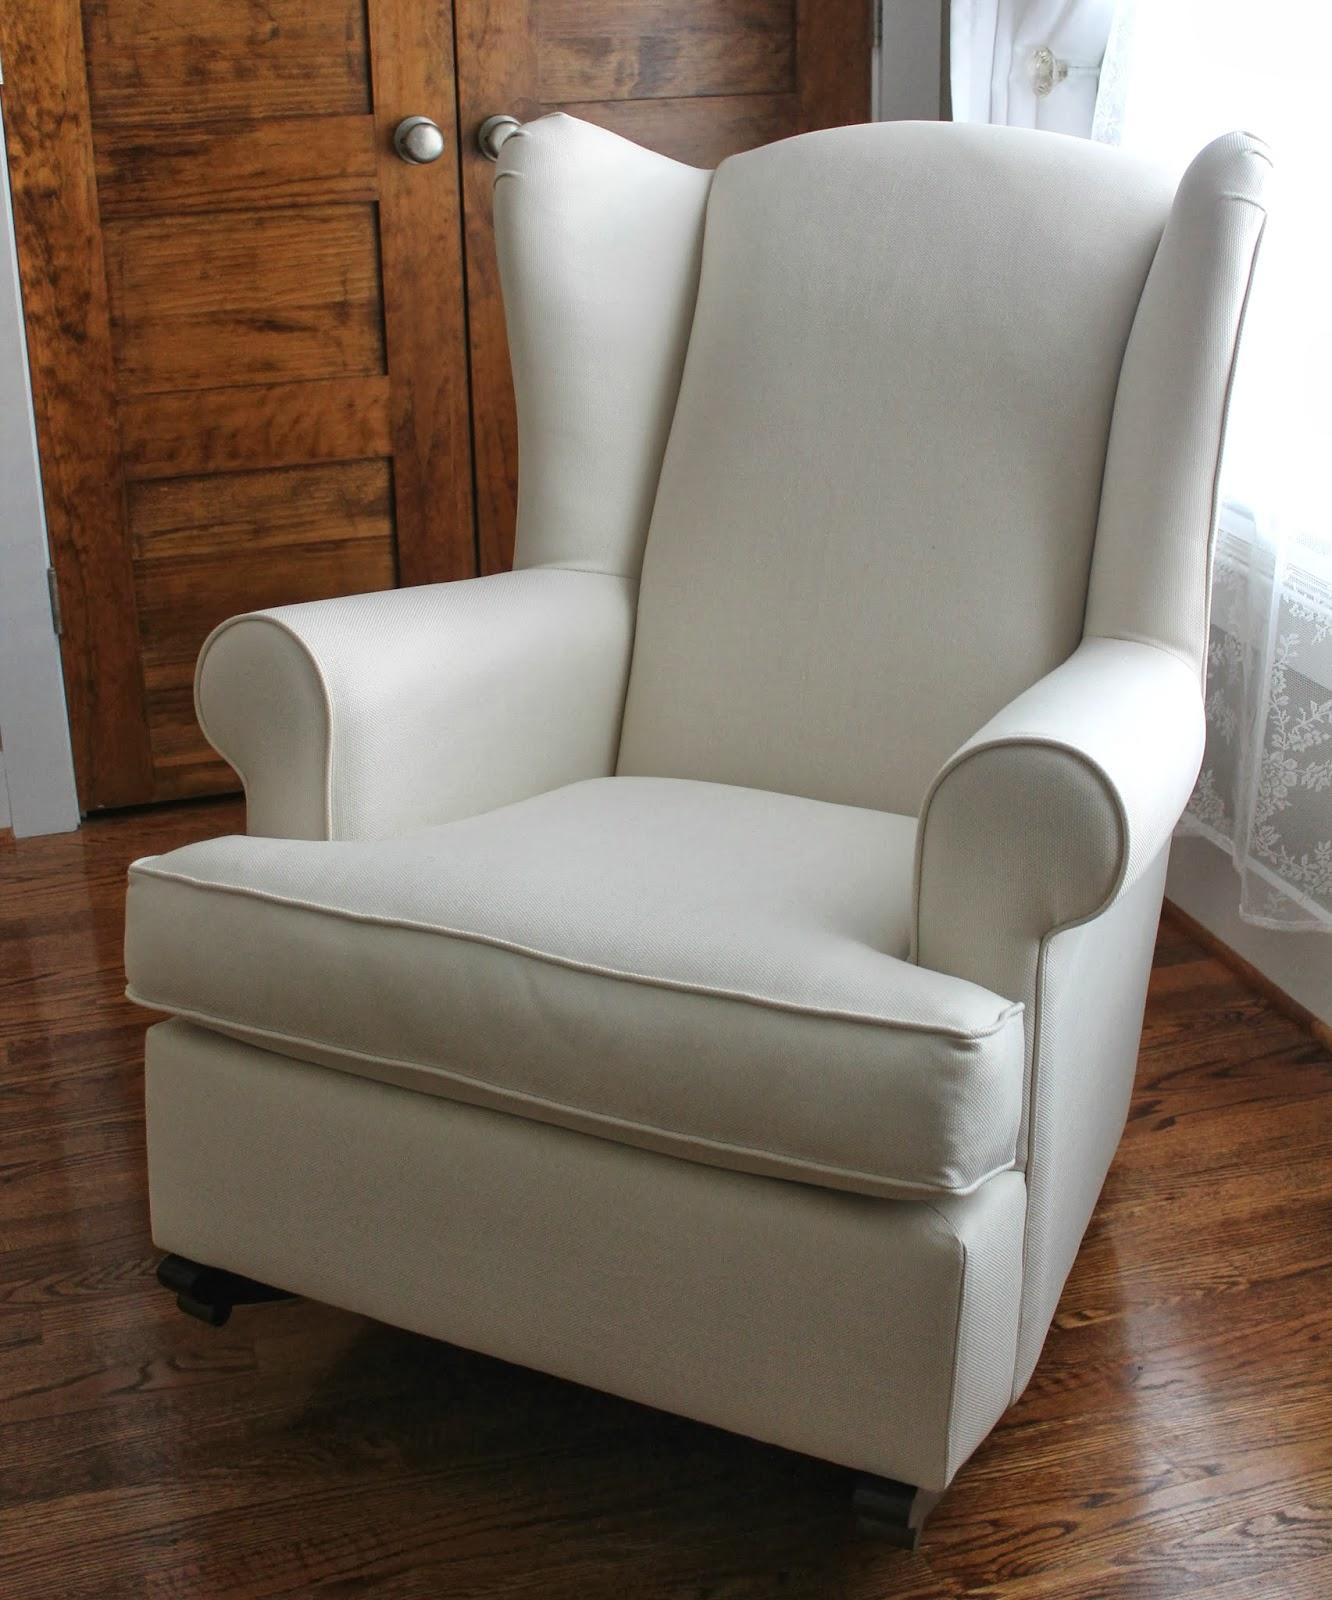 hang around chair pottery barn floor protectors for legs nursery update carolina charm